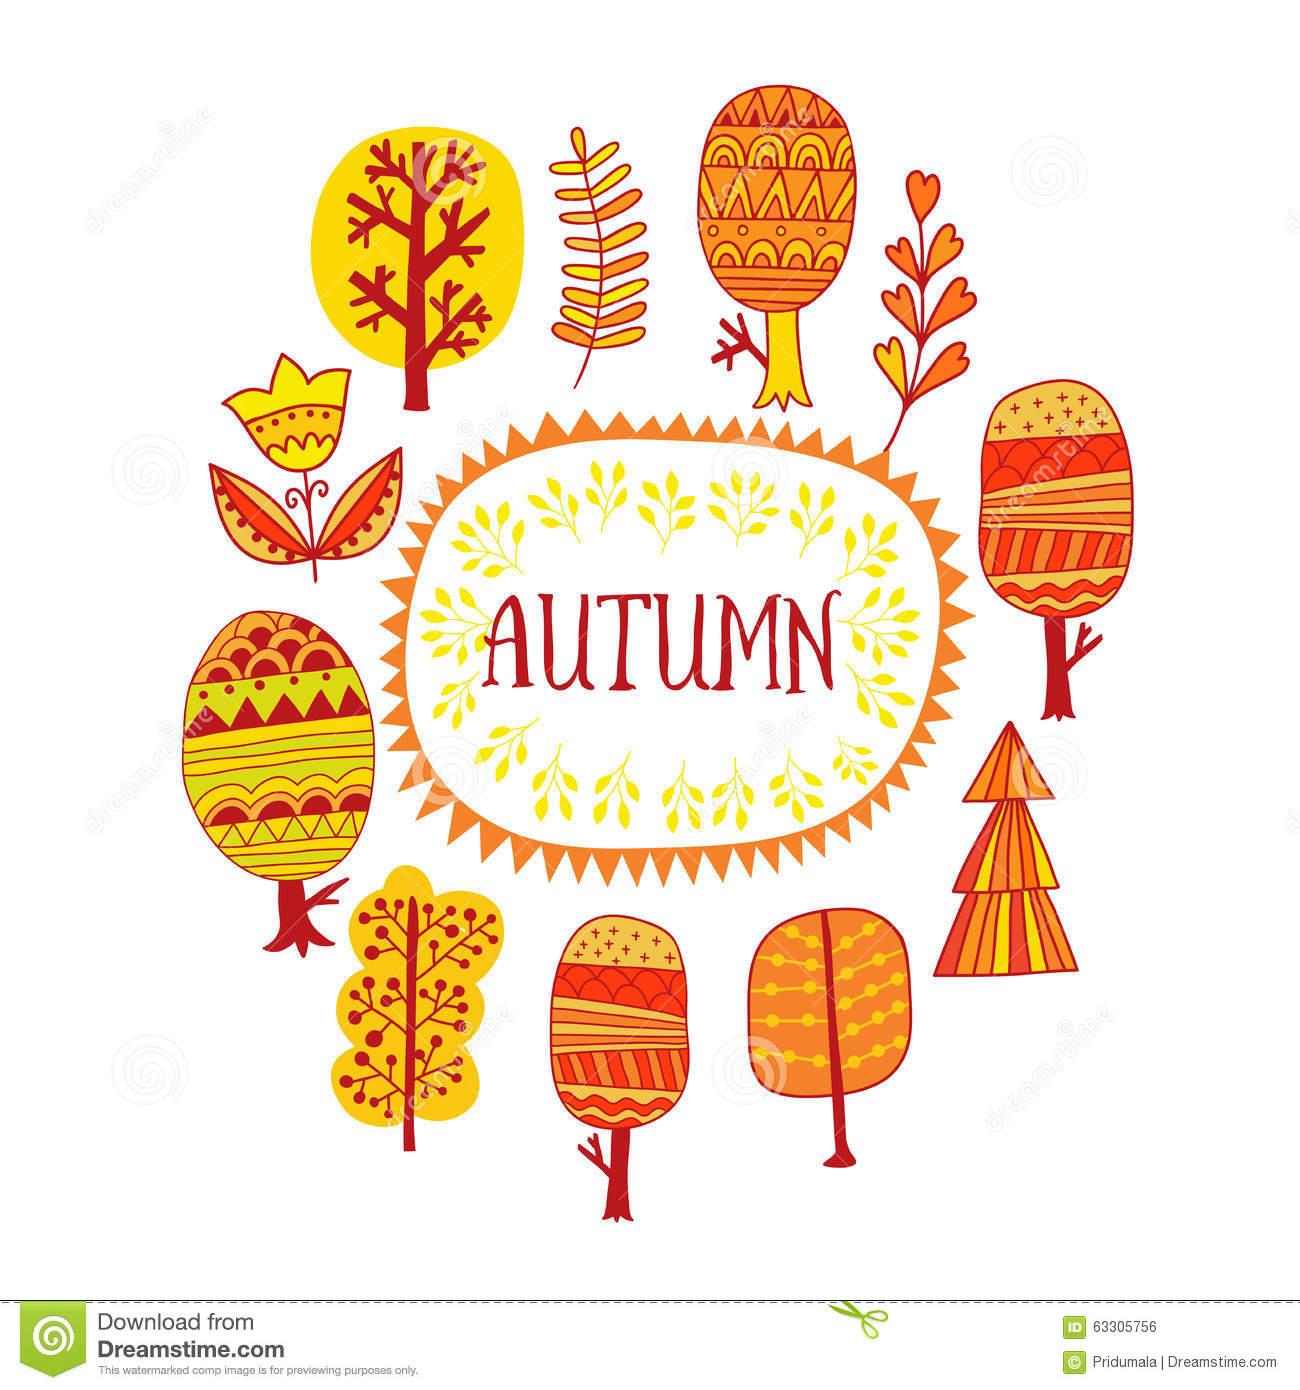 Autumn Trees Design, Frame Illustration, Seasonal Decor. Vector.